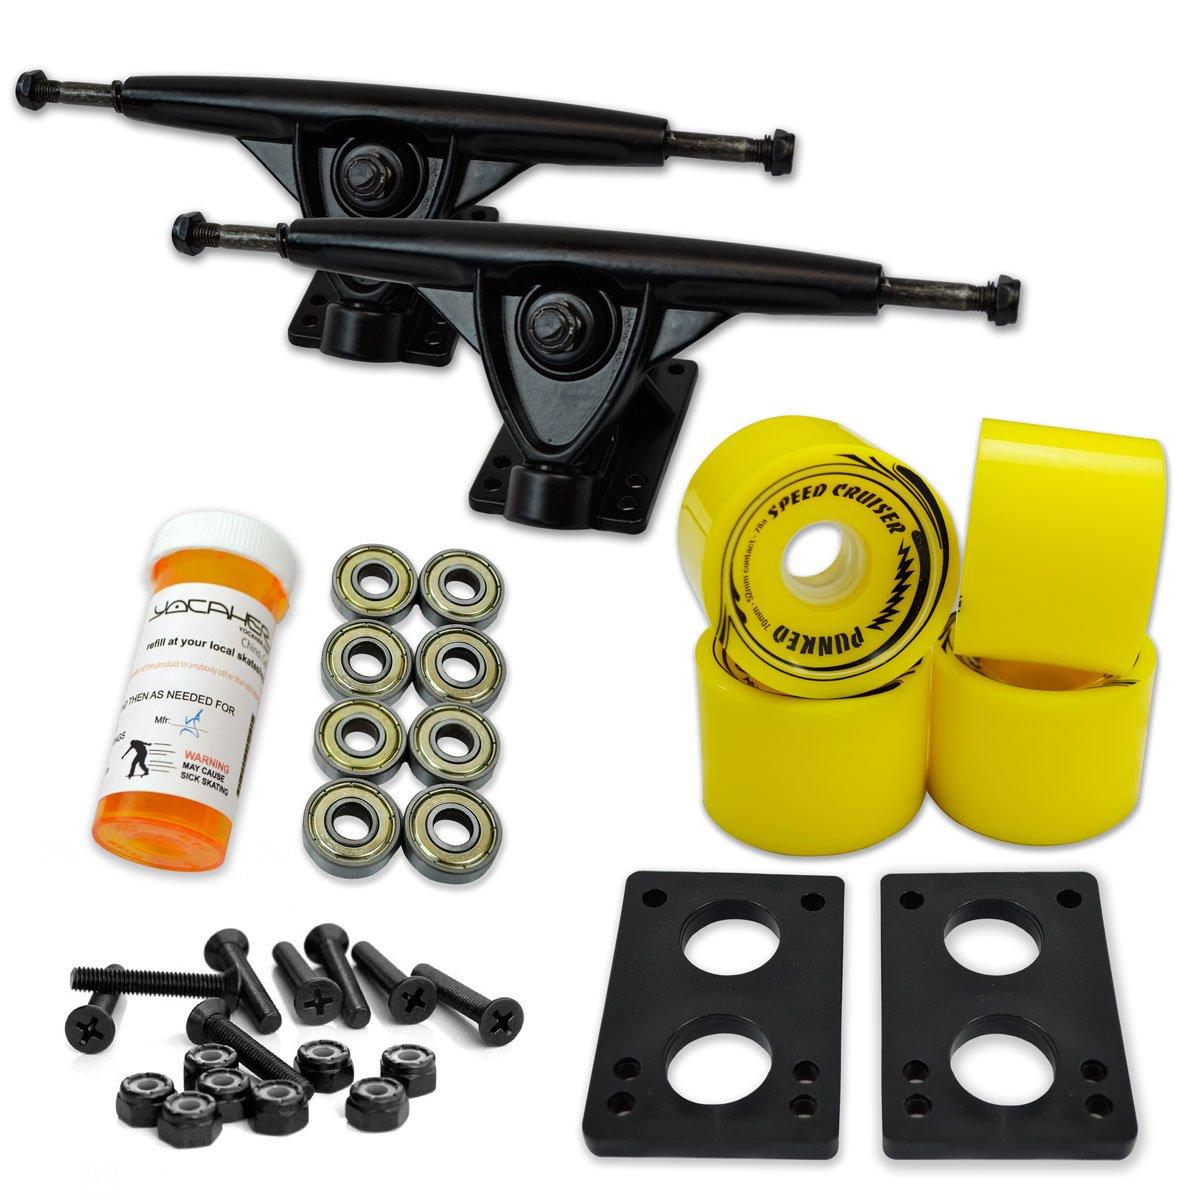 Yocaher LONGBOARD Skateboard TRUCKS COMBO set w/ 71mm WHEELS + 9.675'' Polished/Black trucks Package, Solid Yellow Wheel, Polished Trucks by Yocaher